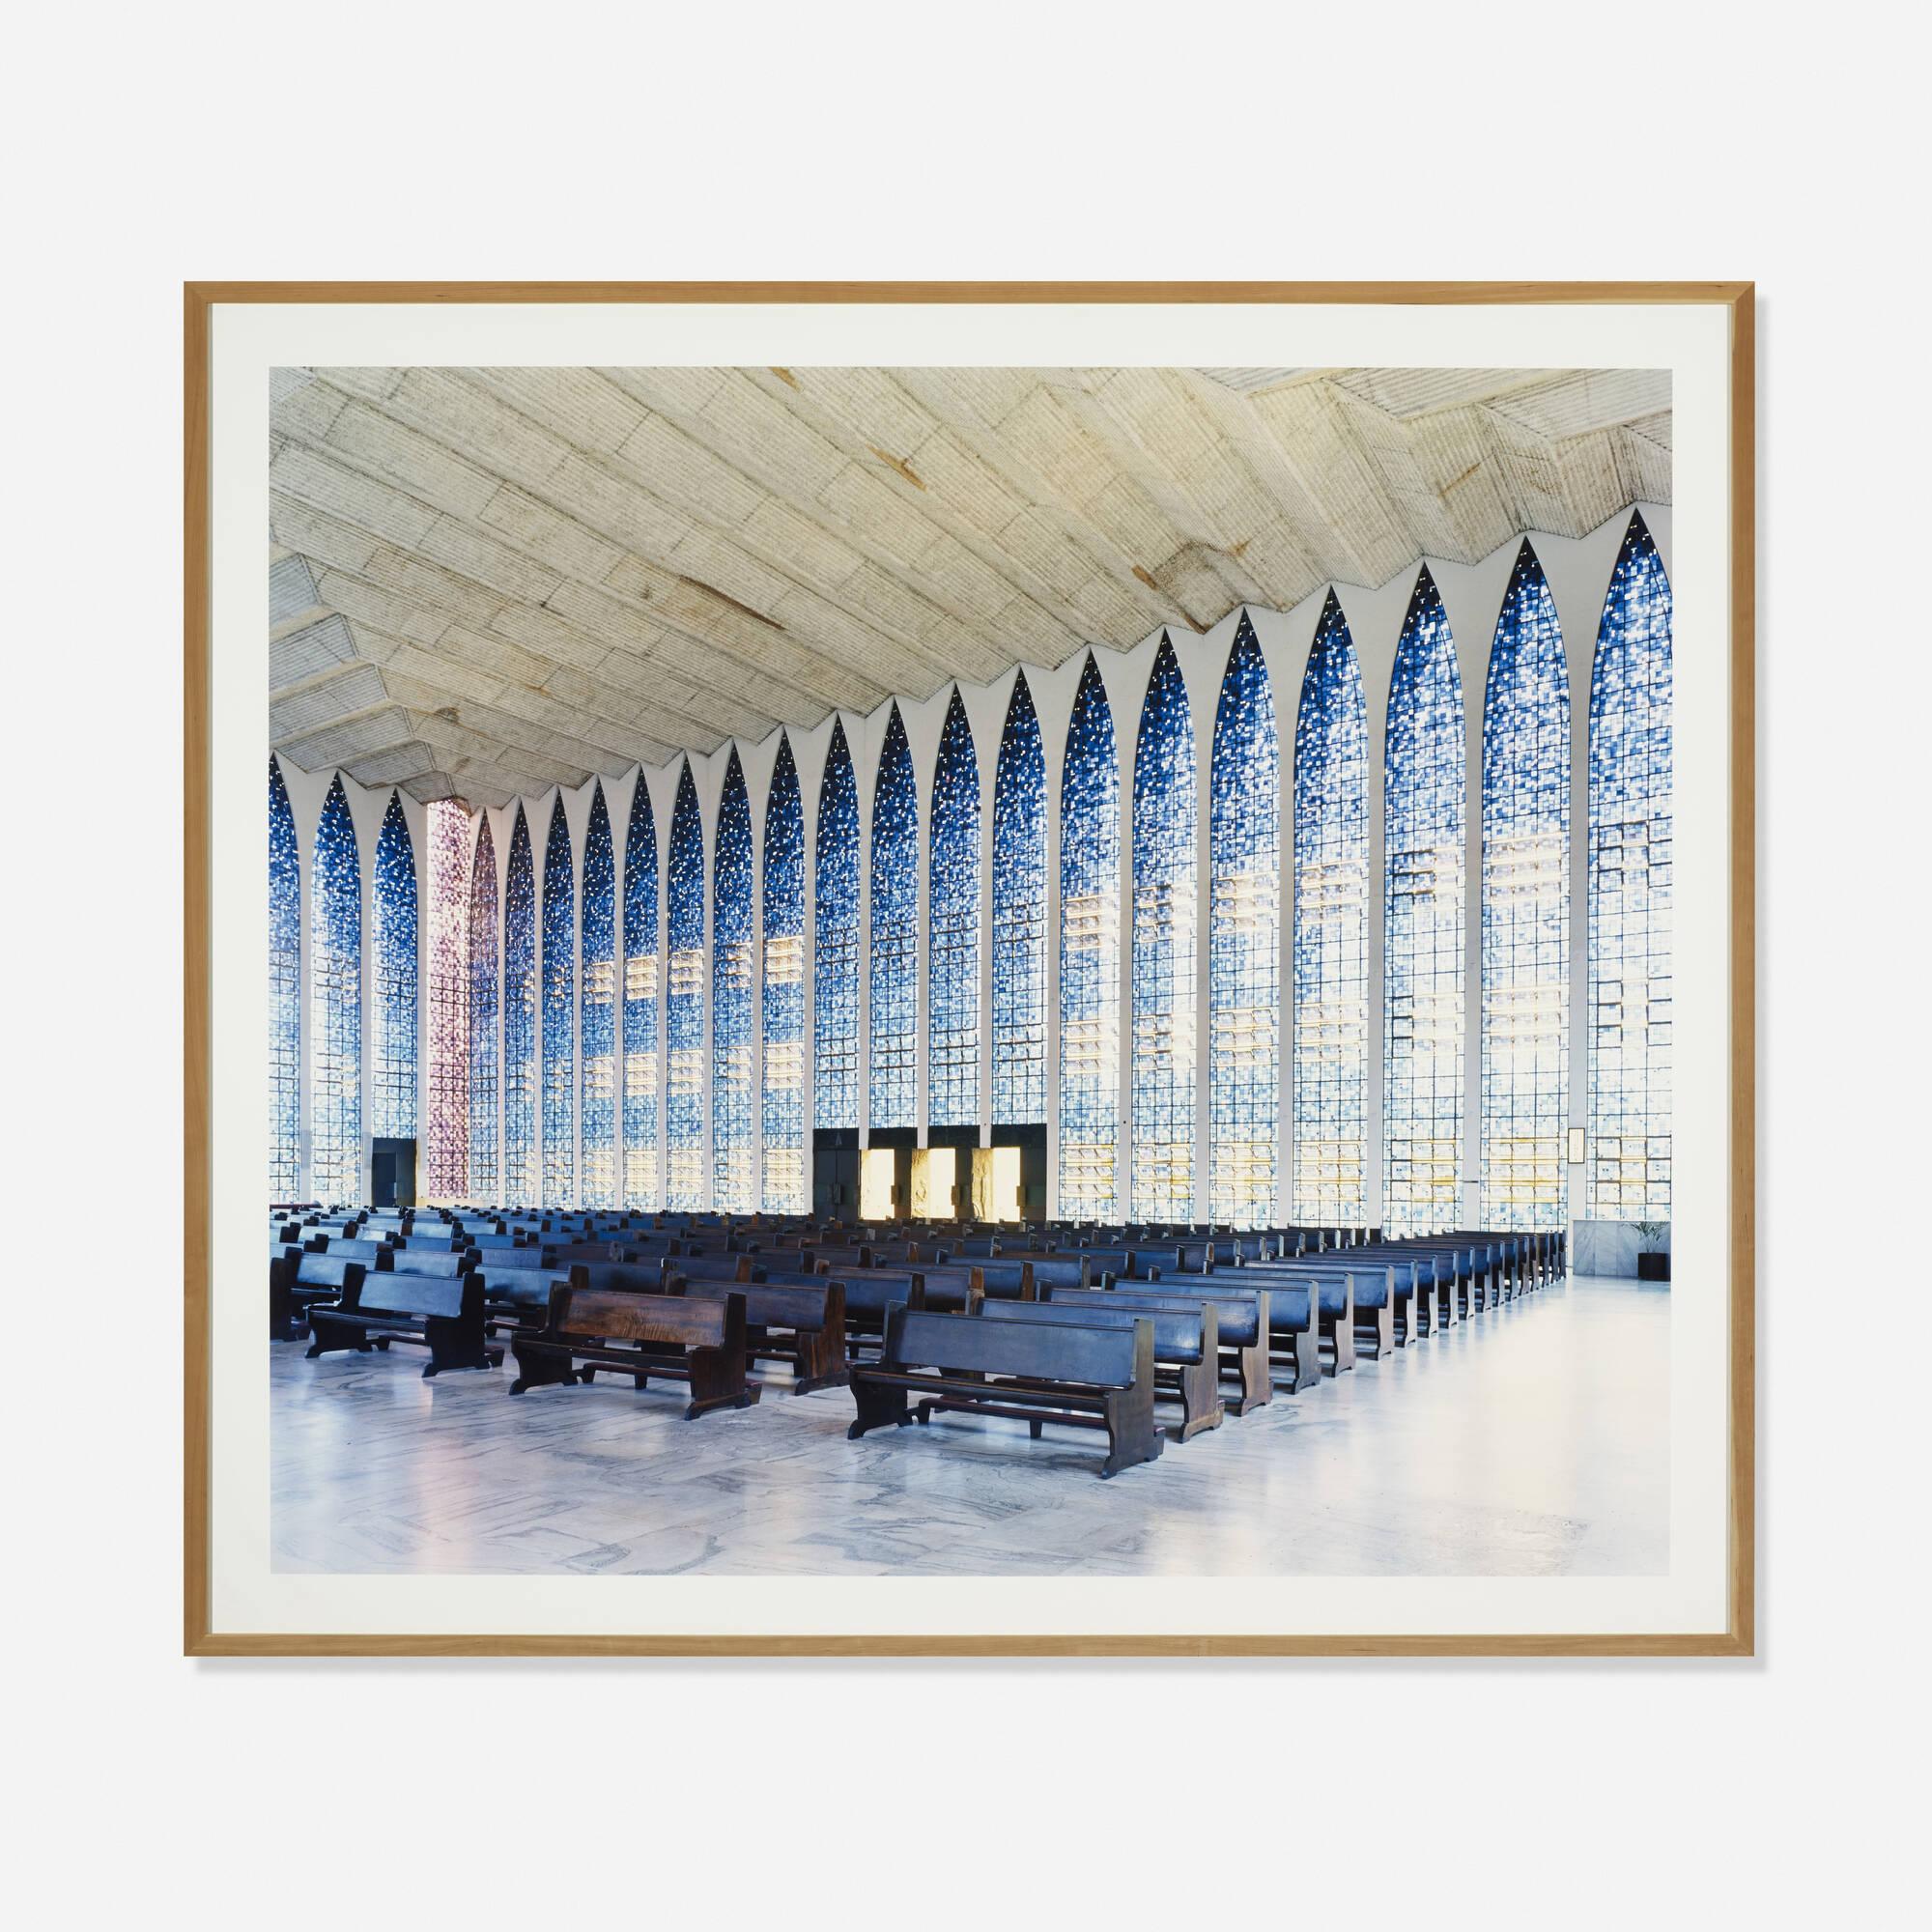 188: Candida Höfer / Santuario dom Bosco (1 of 1)